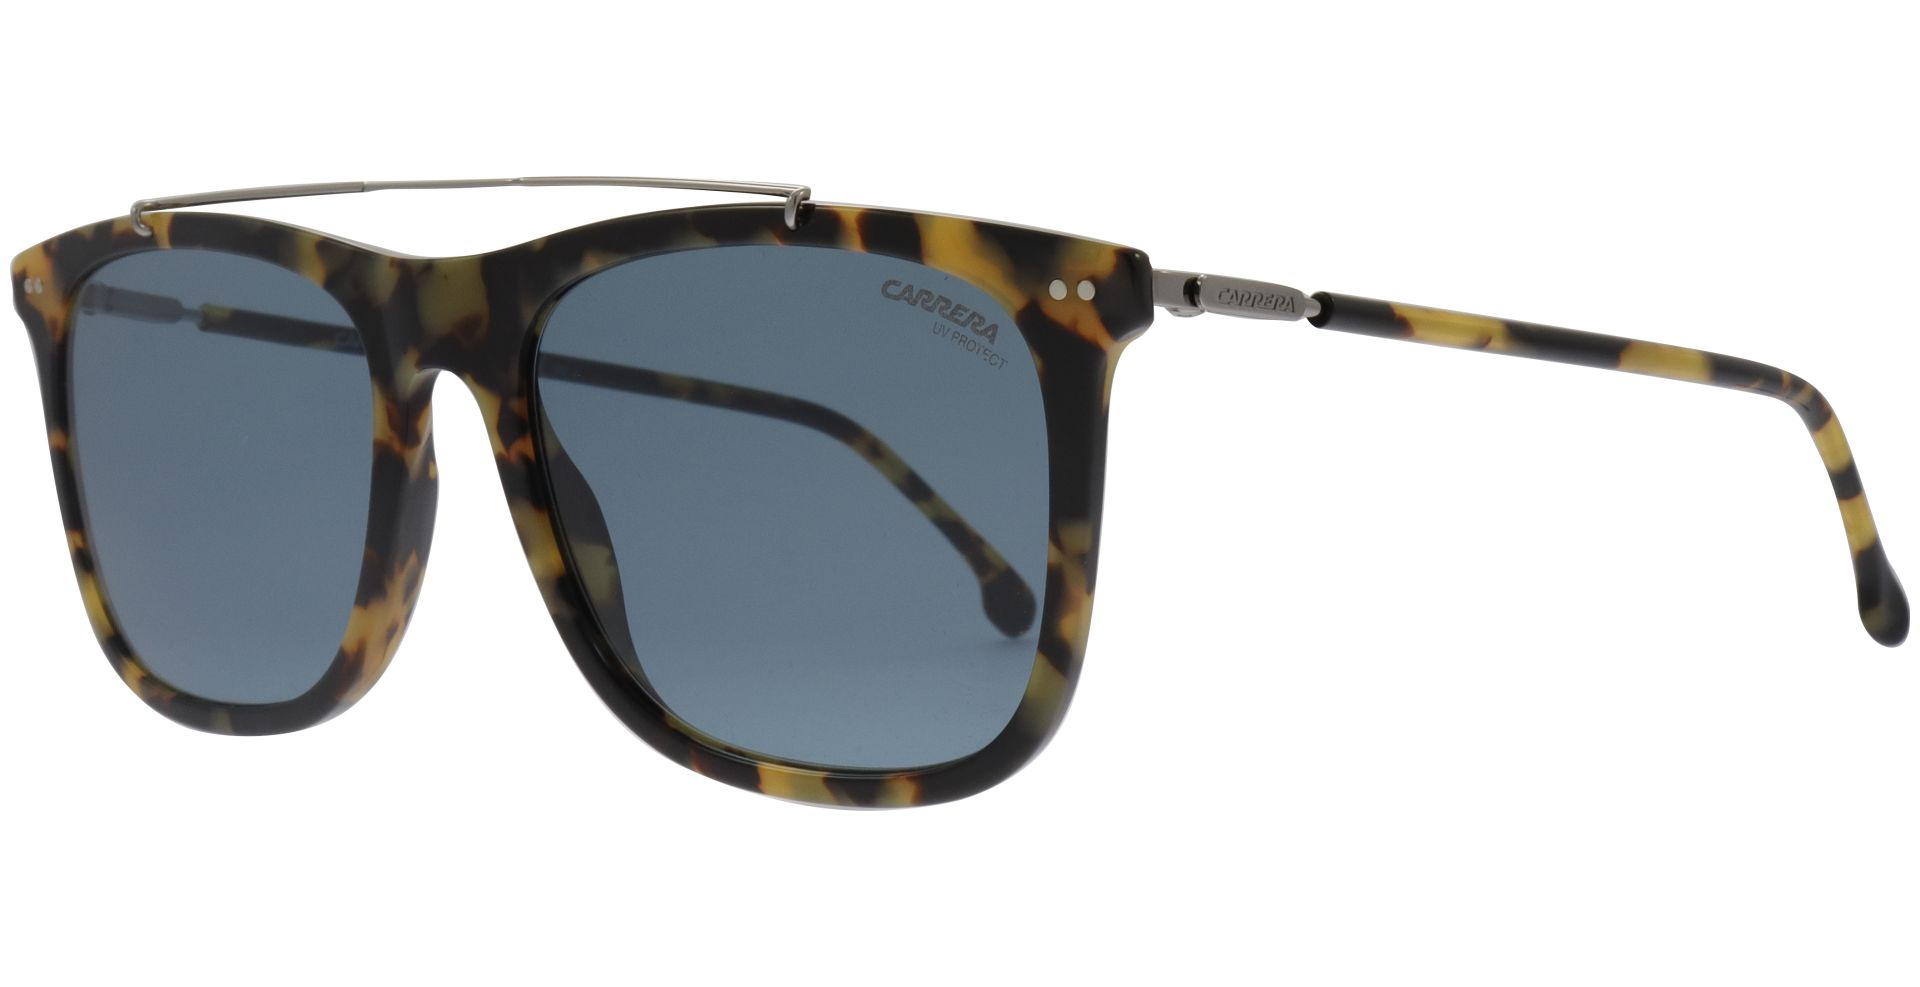 Carrera CA150/S Sonnenbrille Schwarz 807 55mm qEW5O